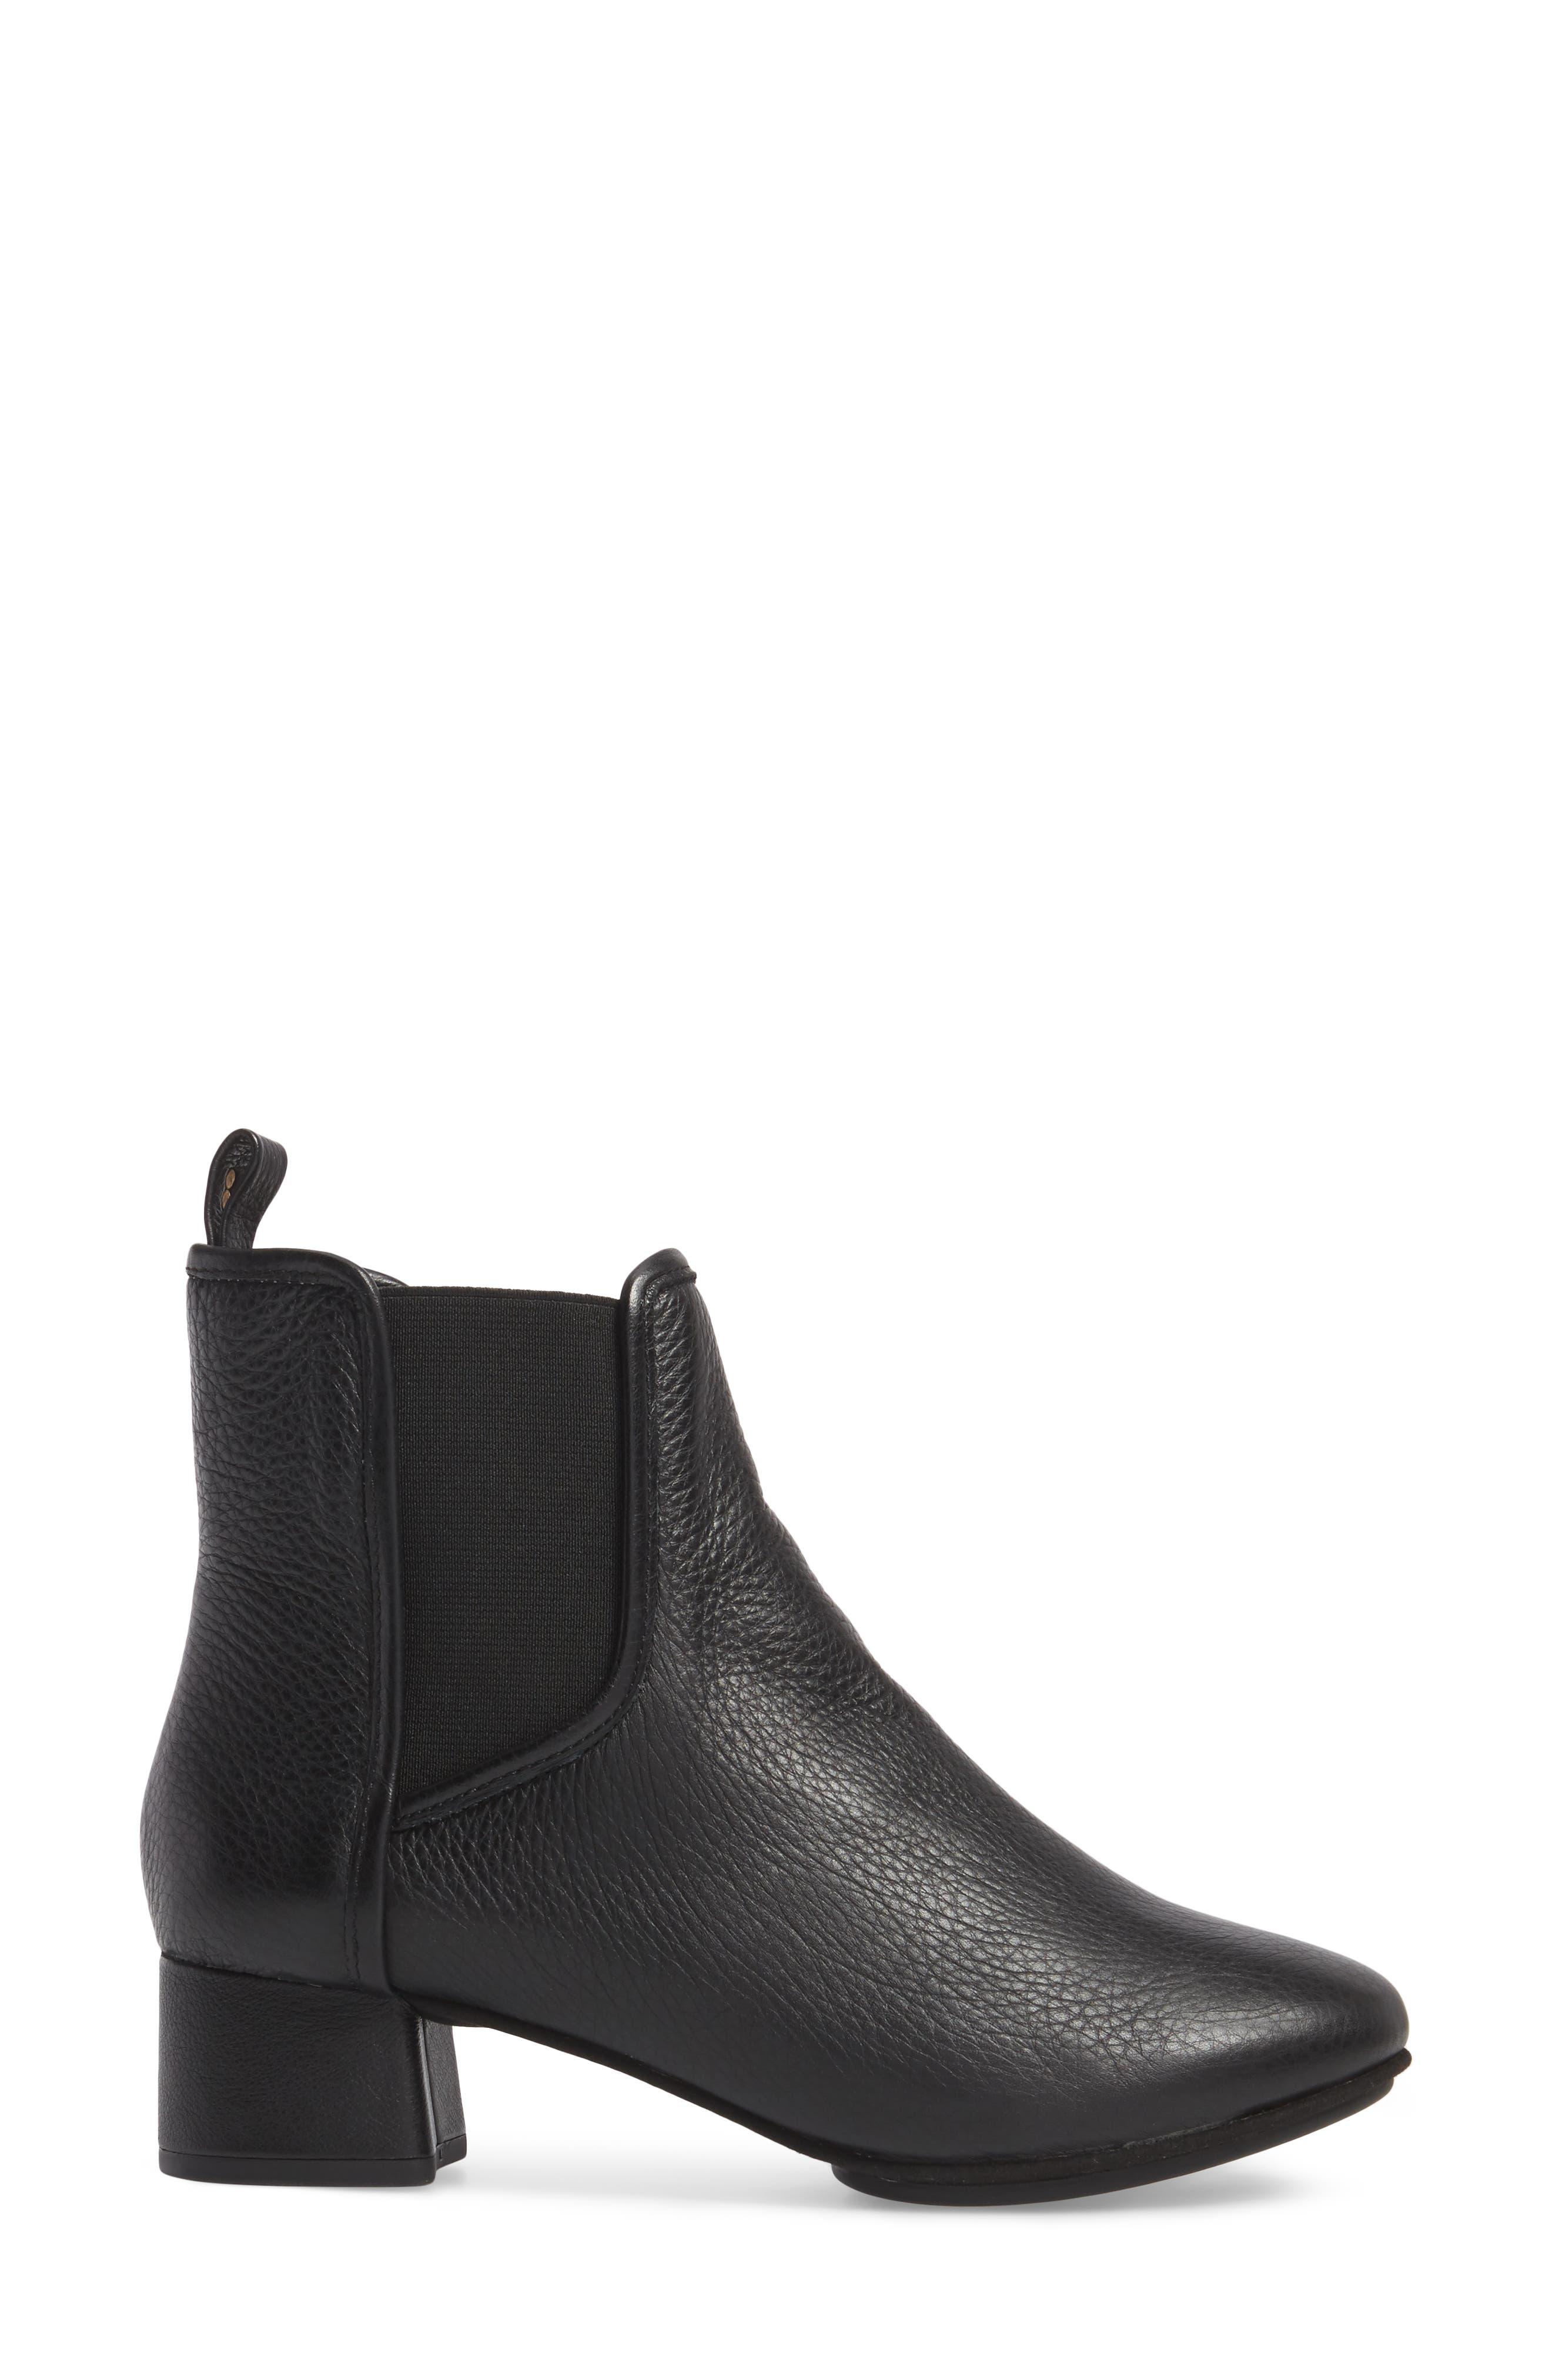 Penelope Chelsea Boot,                             Alternate thumbnail 3, color,                             Black Leather